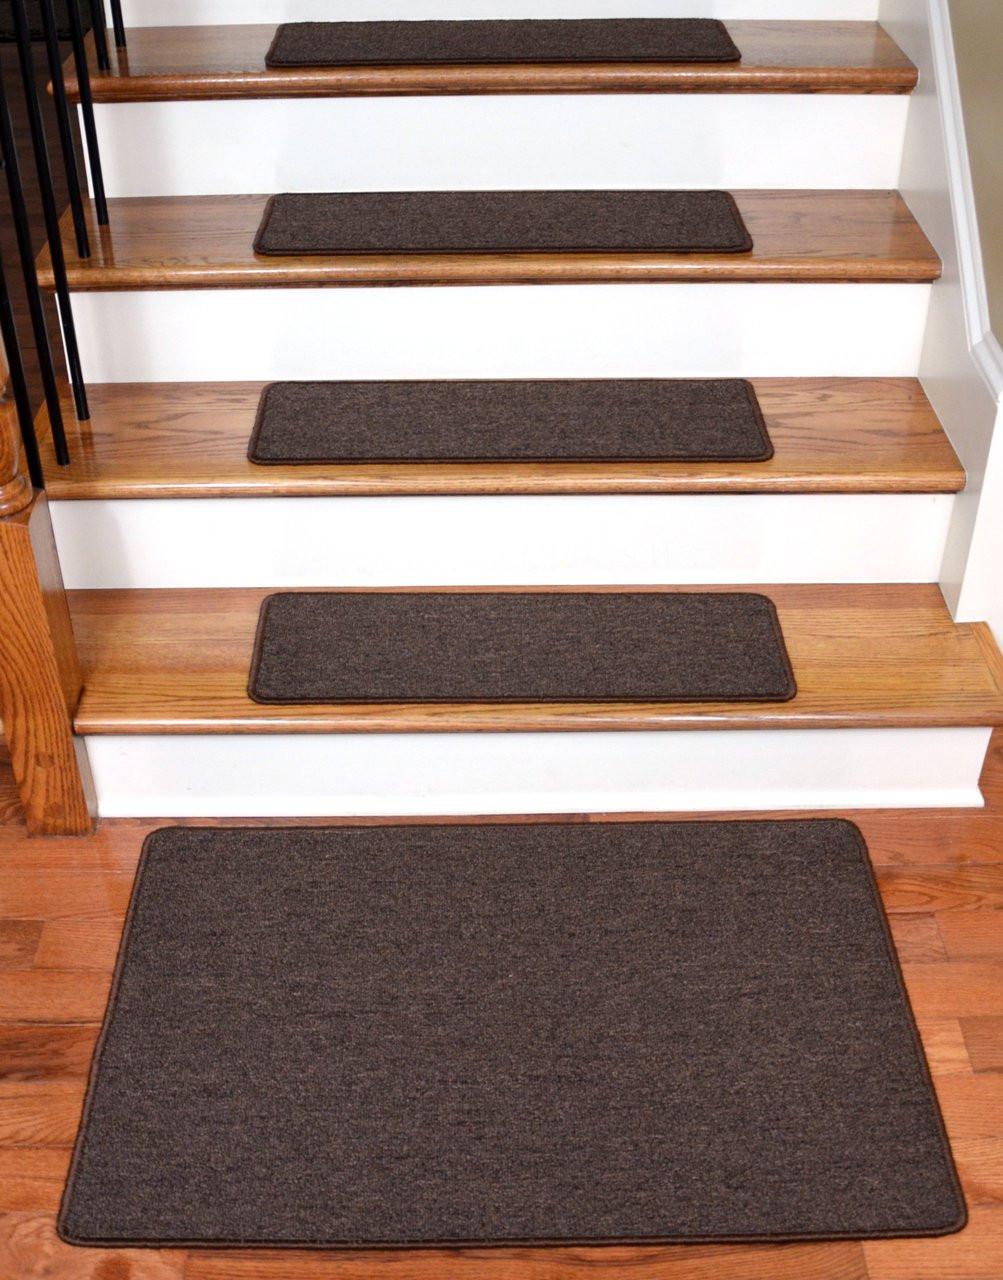 Dark Brown Slip Proof Stair Tread : Dean serged diy carpet stair treads quot dark brown